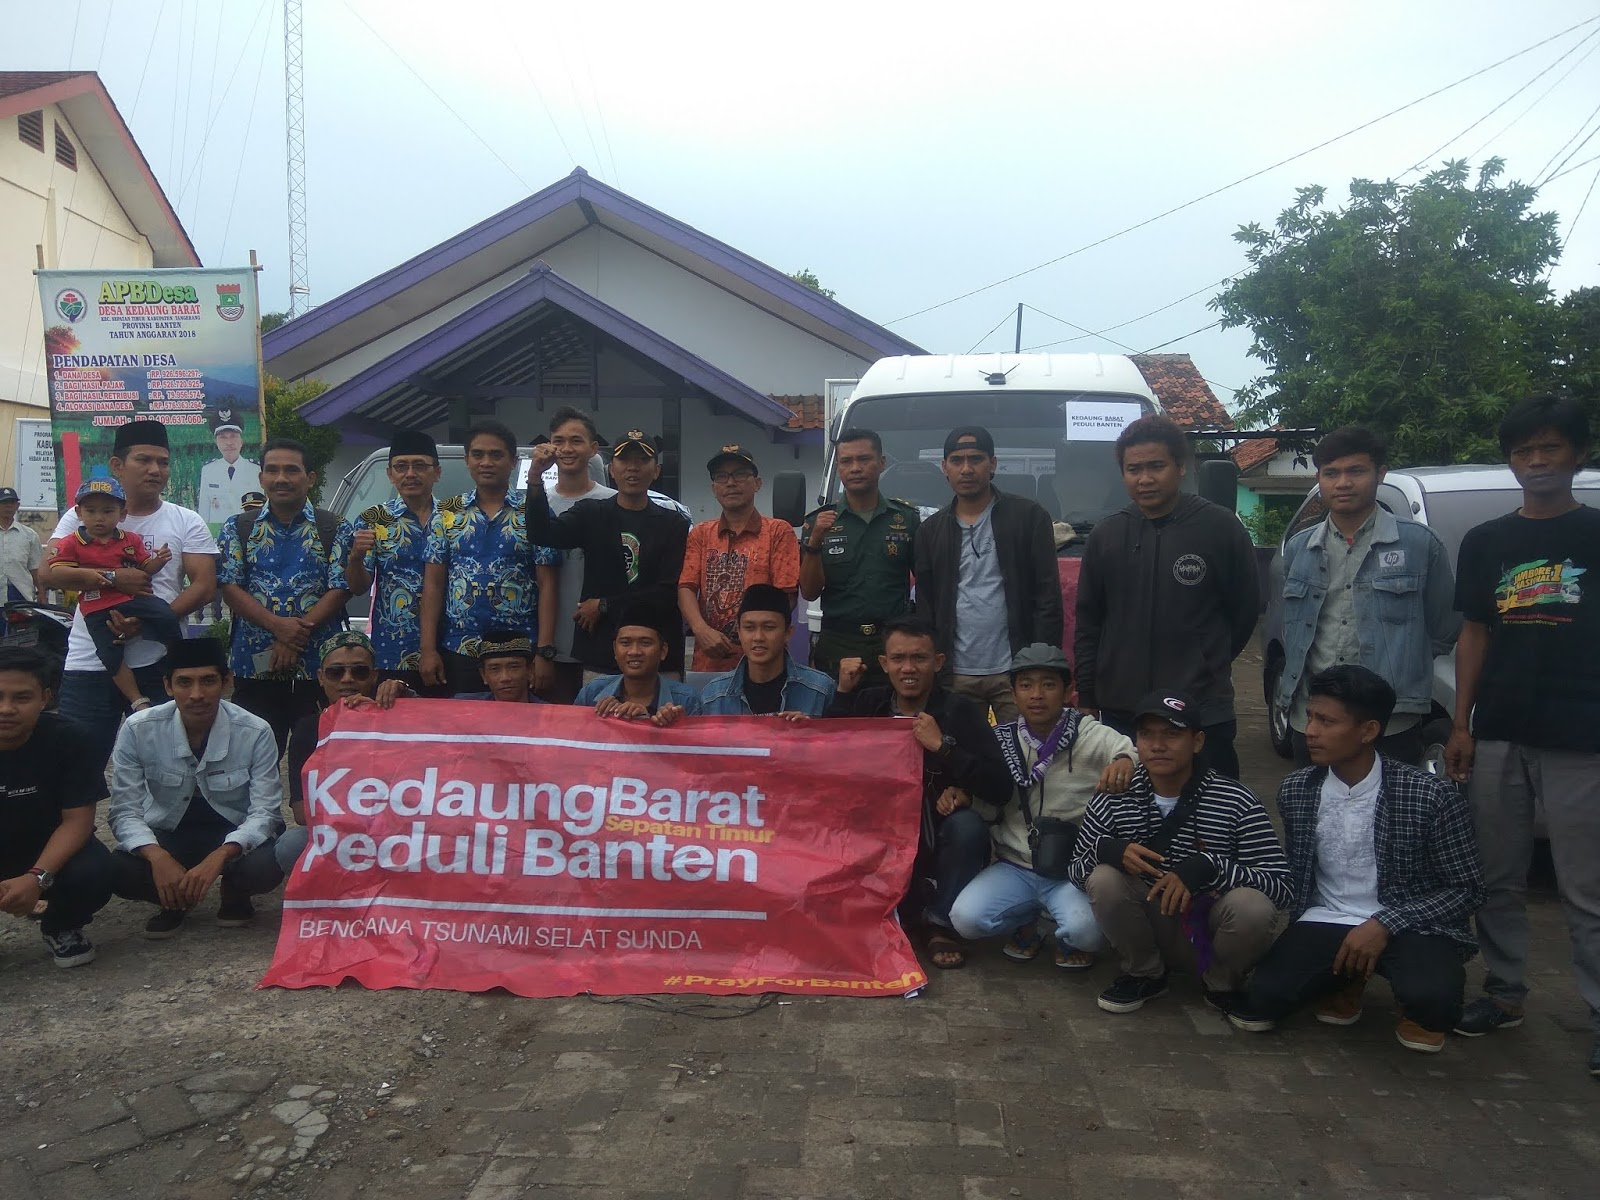 Karang Taruna Bina Remaja Desa Kedaung Barat Salurkan Batuan Bencana Stunami Di Banten